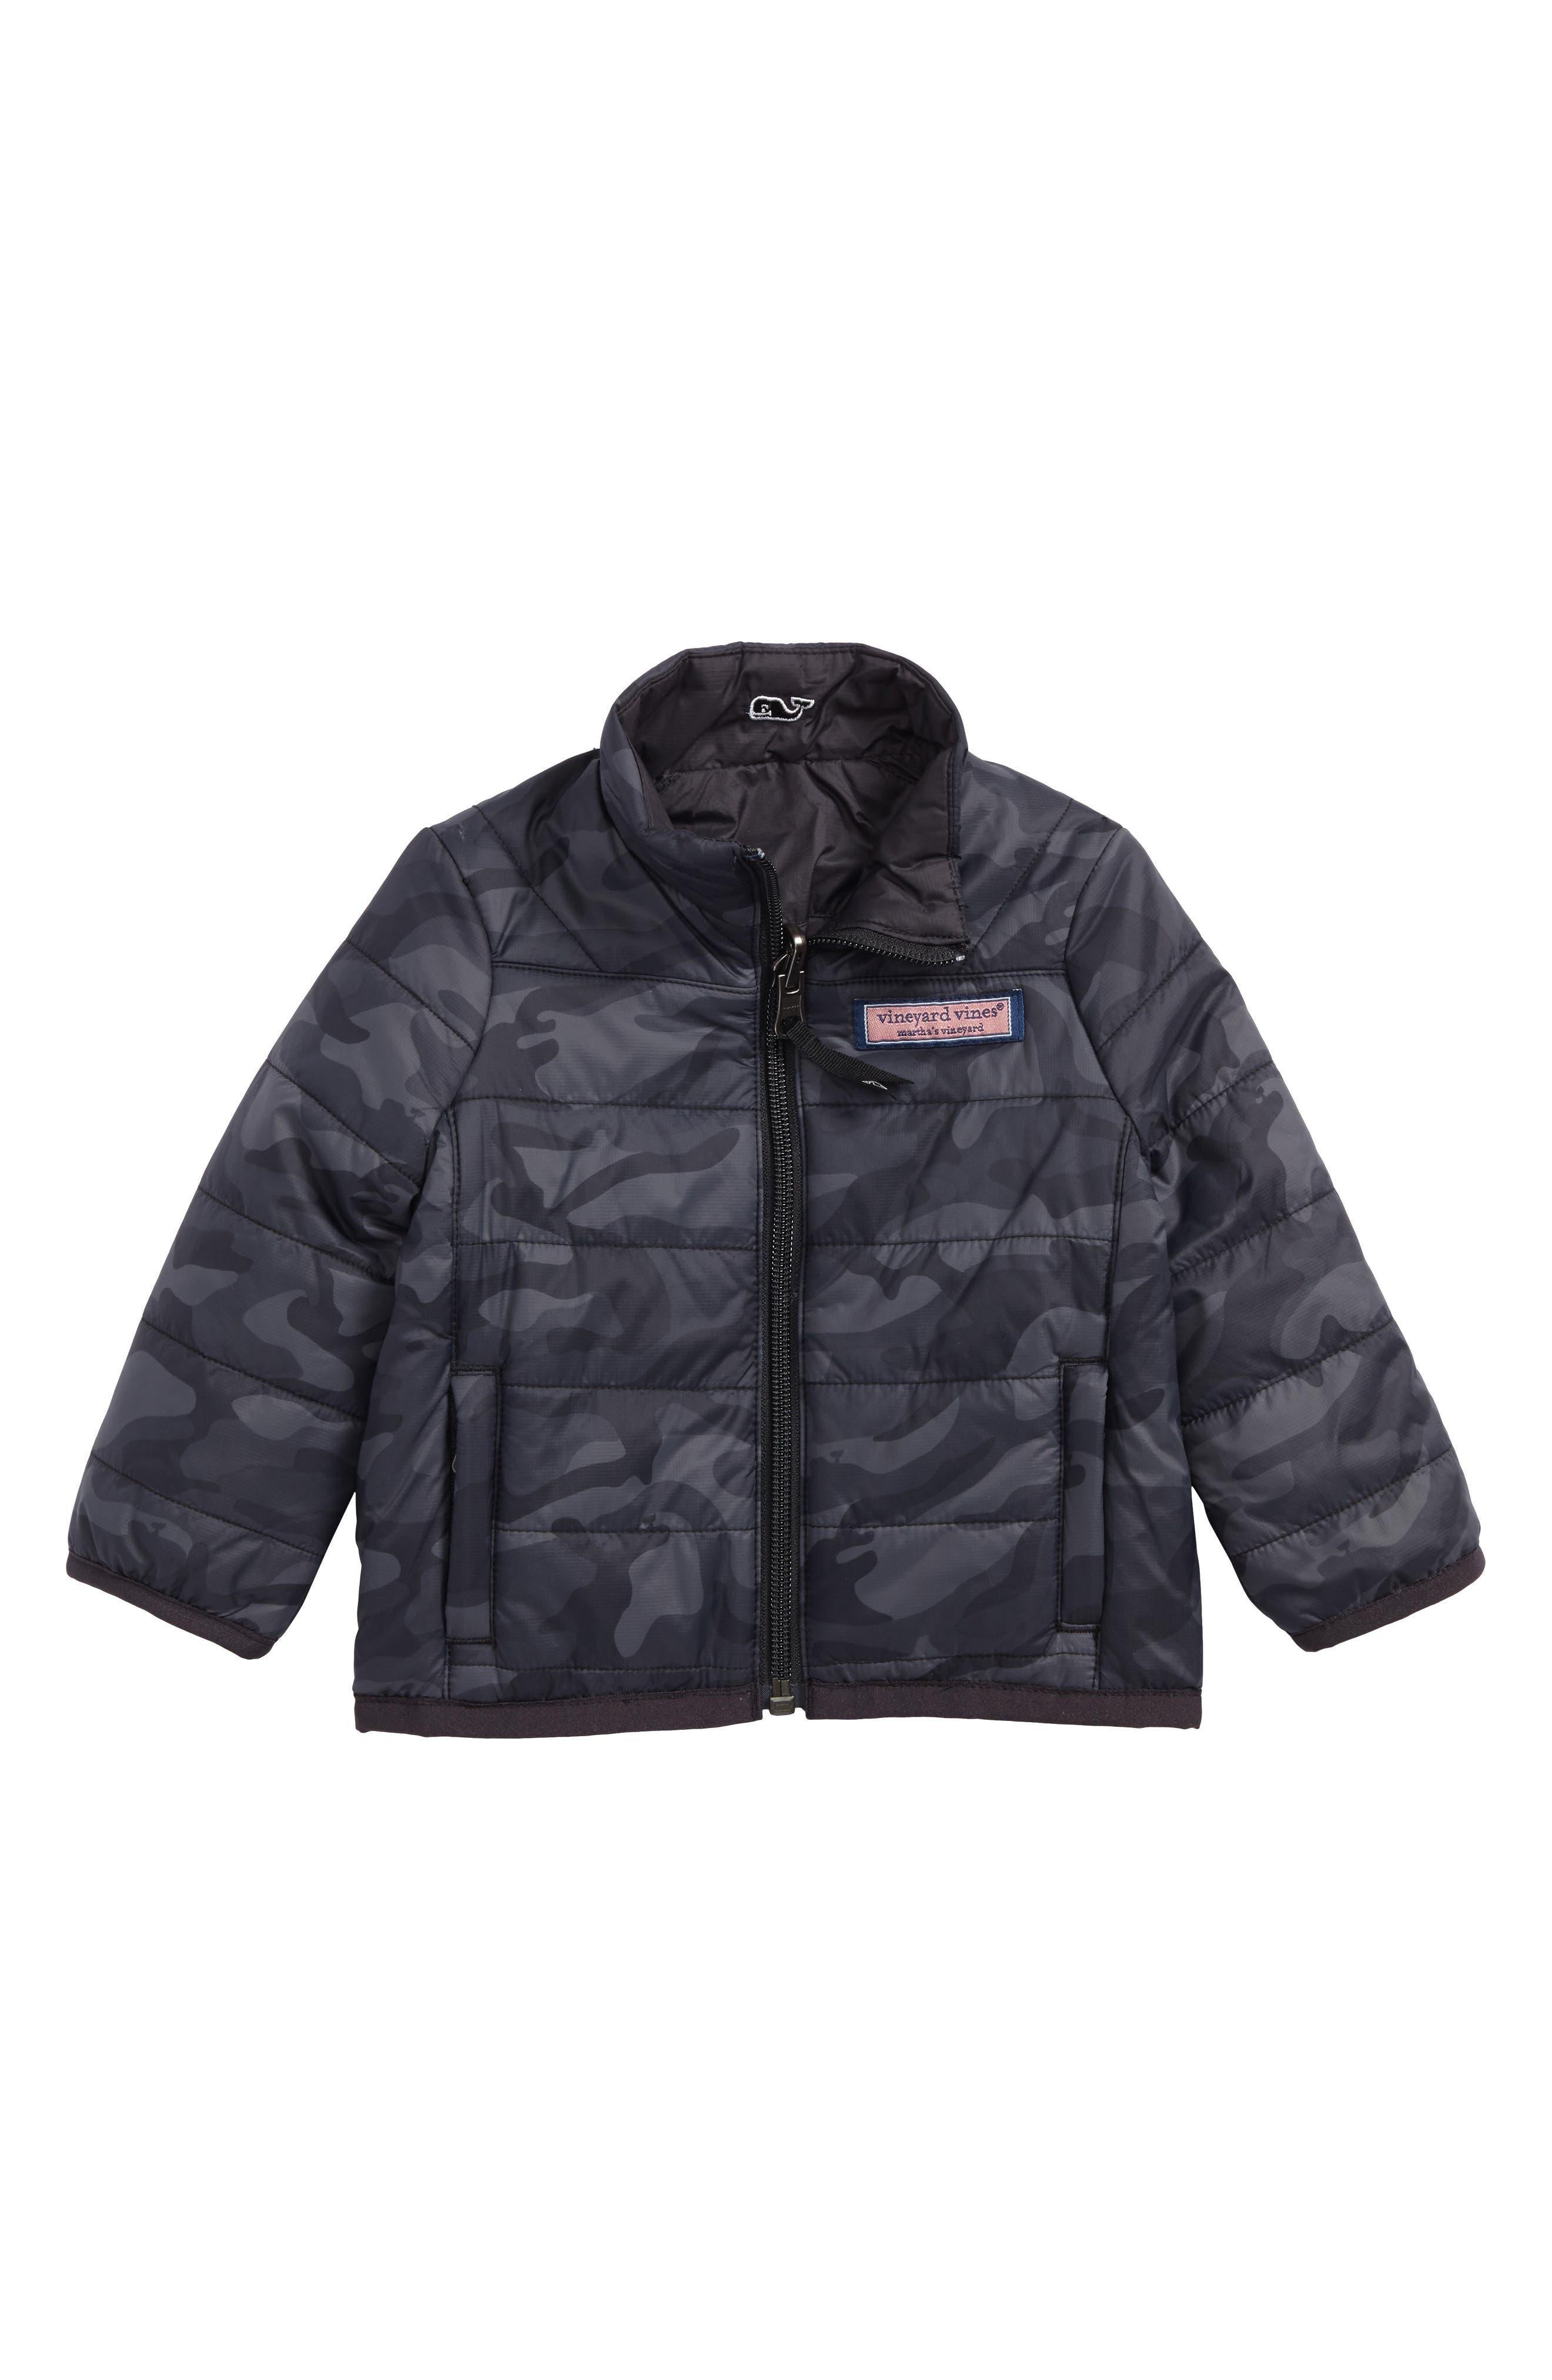 Reversible Mountain Weekend Jacket,                         Main,                         color, Jet Black